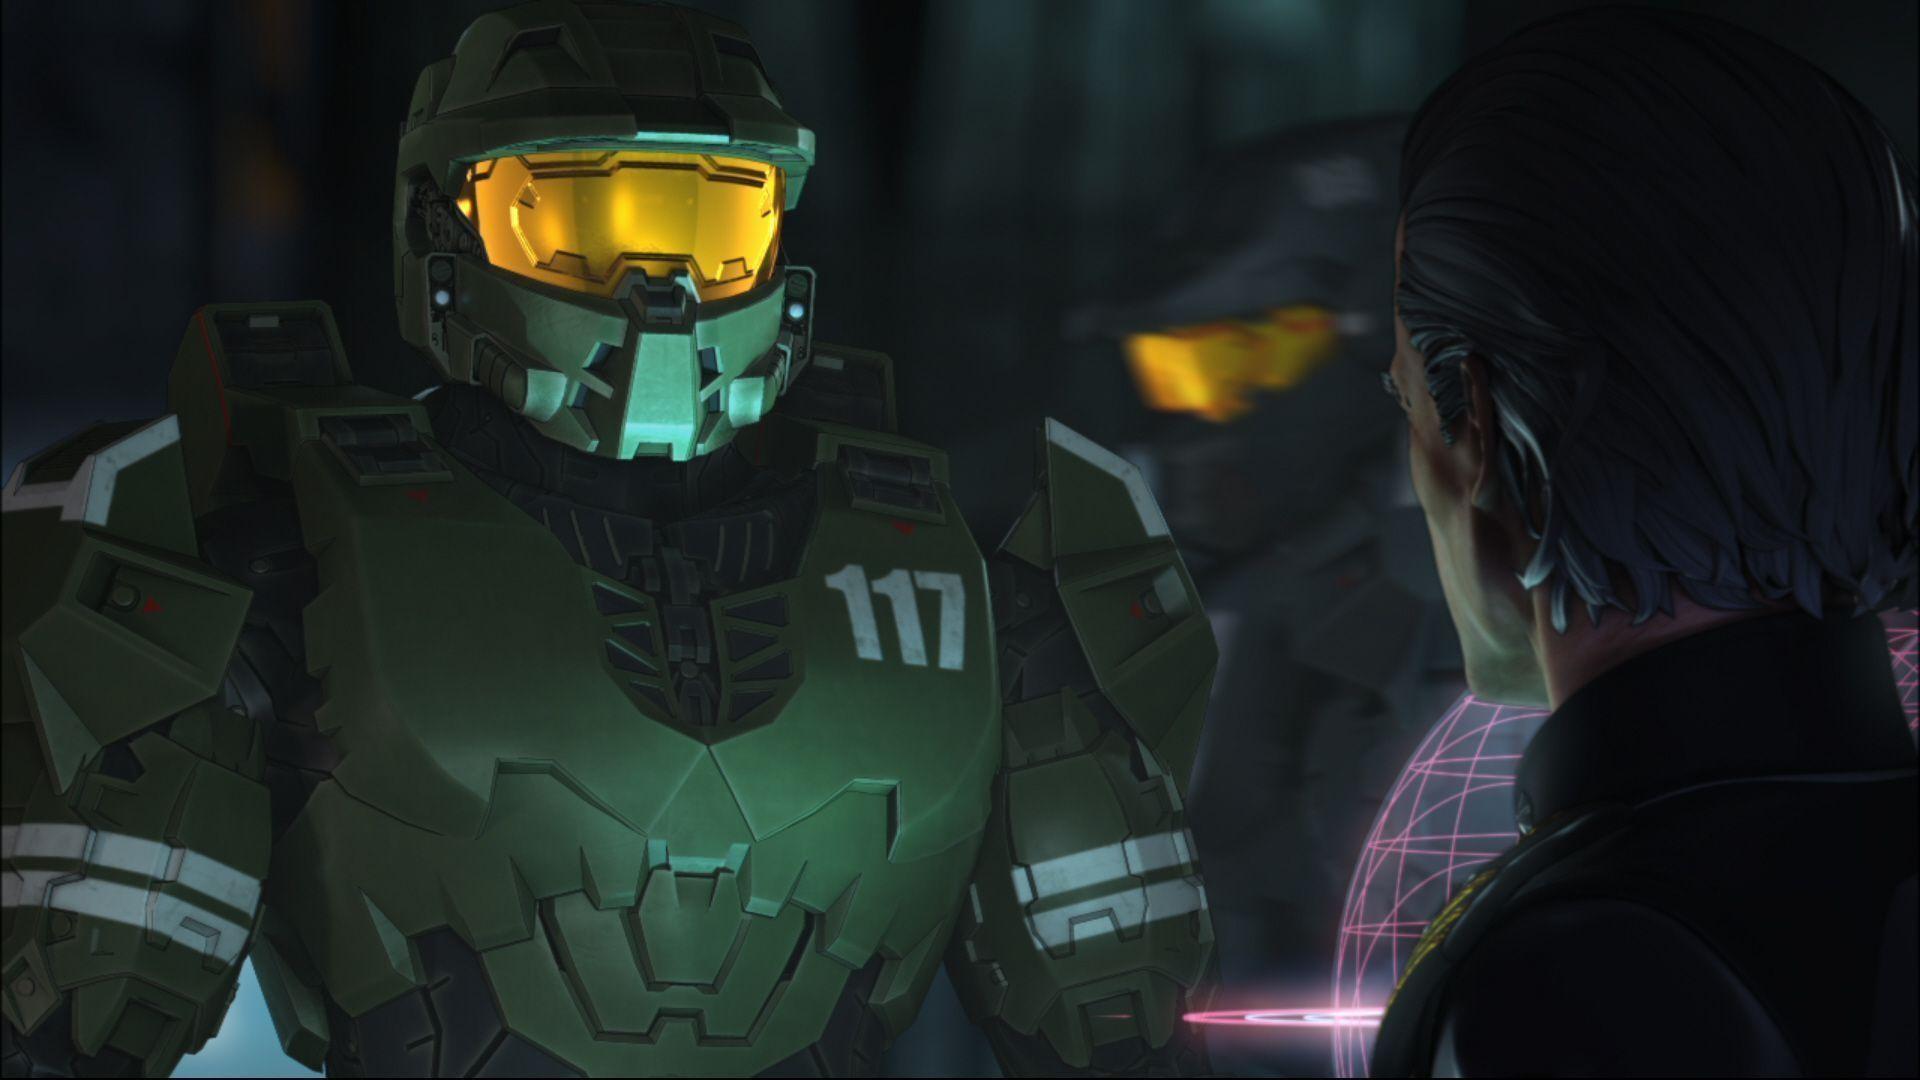 Halo Legends Master Chief wallpaper – 249149